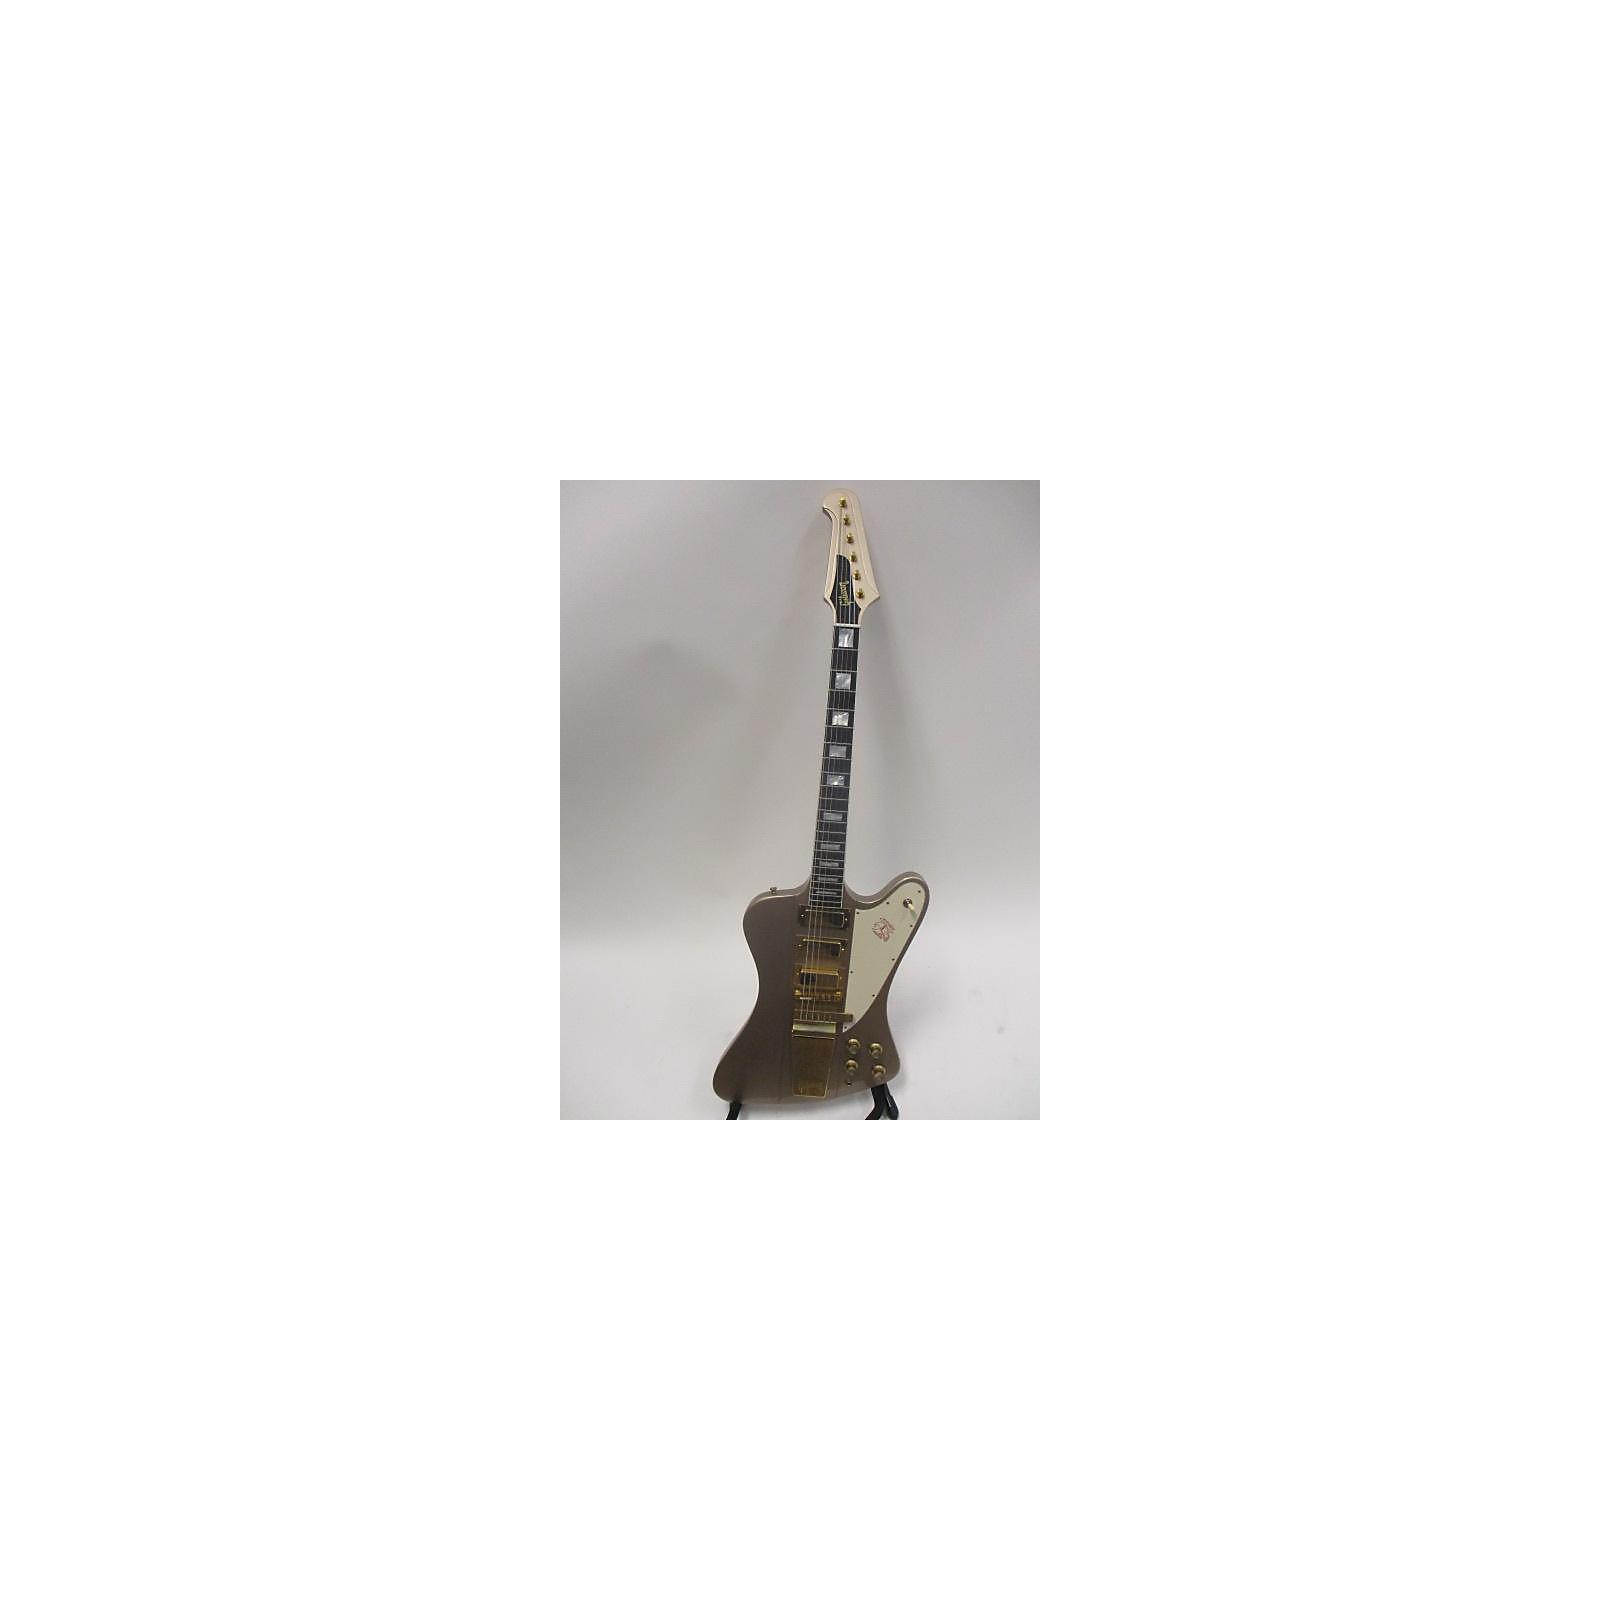 Gibson 2013 Firebird VII 1965 20th Anniversary Custom Shop Solid Body Electric Guitar